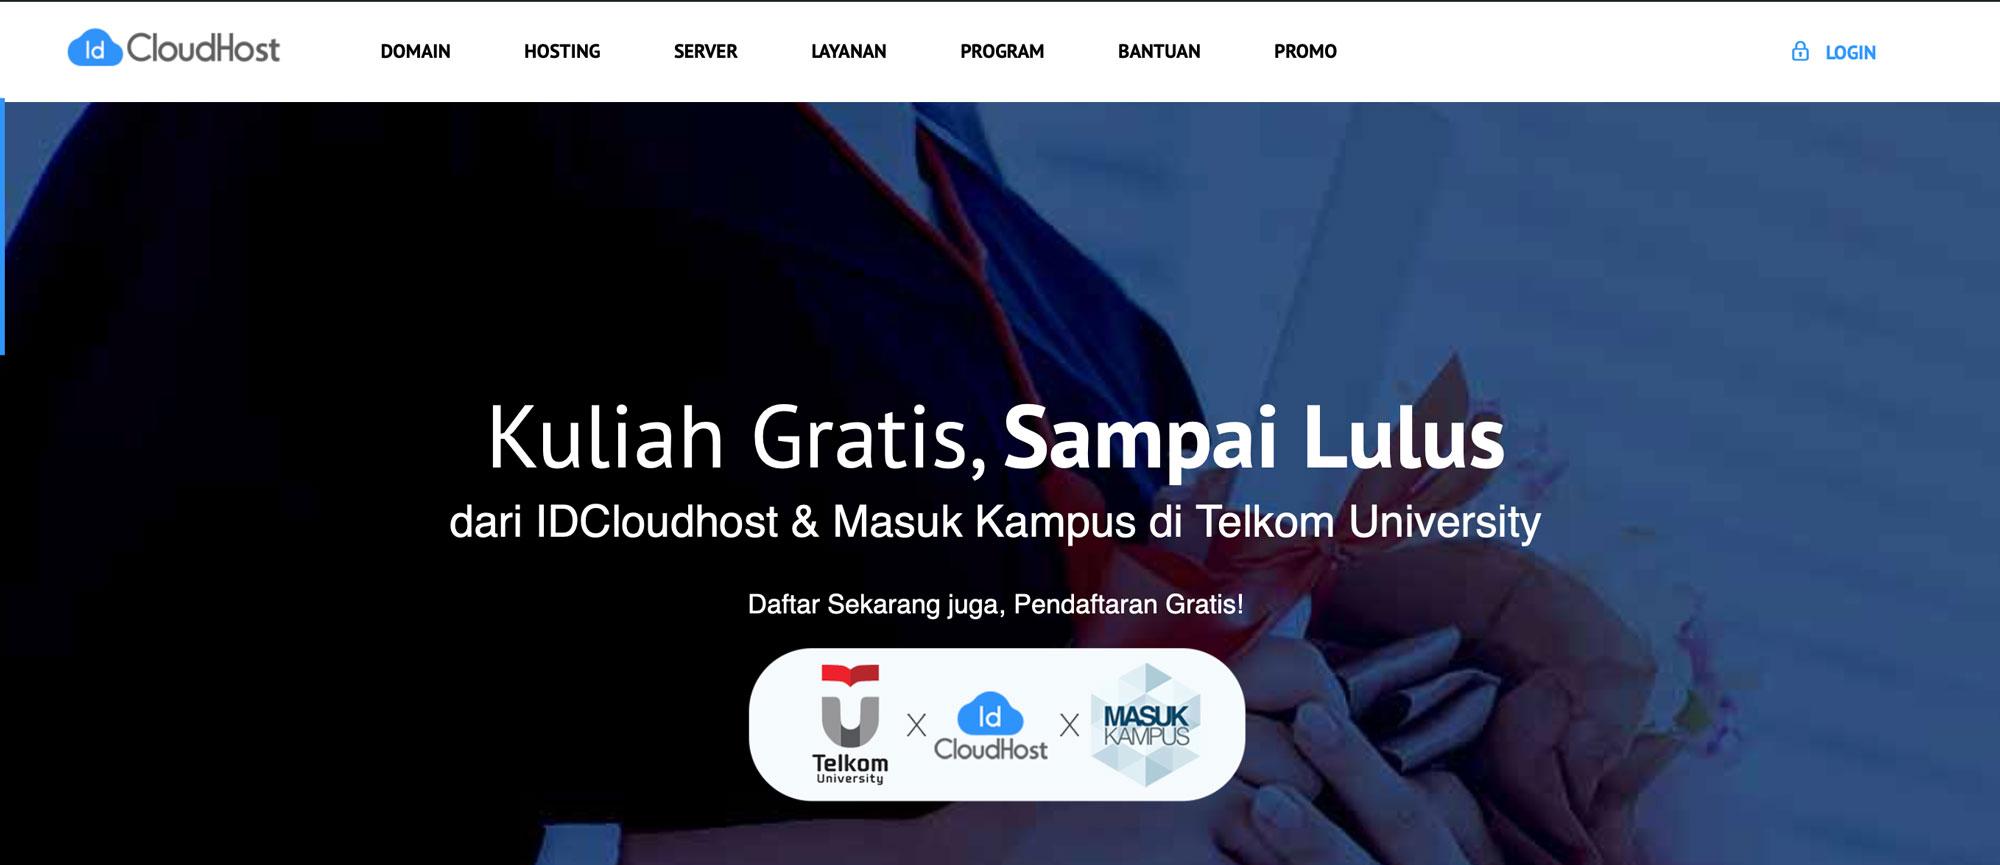 Beasiswa IDCloudhost - Beasiswa Indonesia 2020